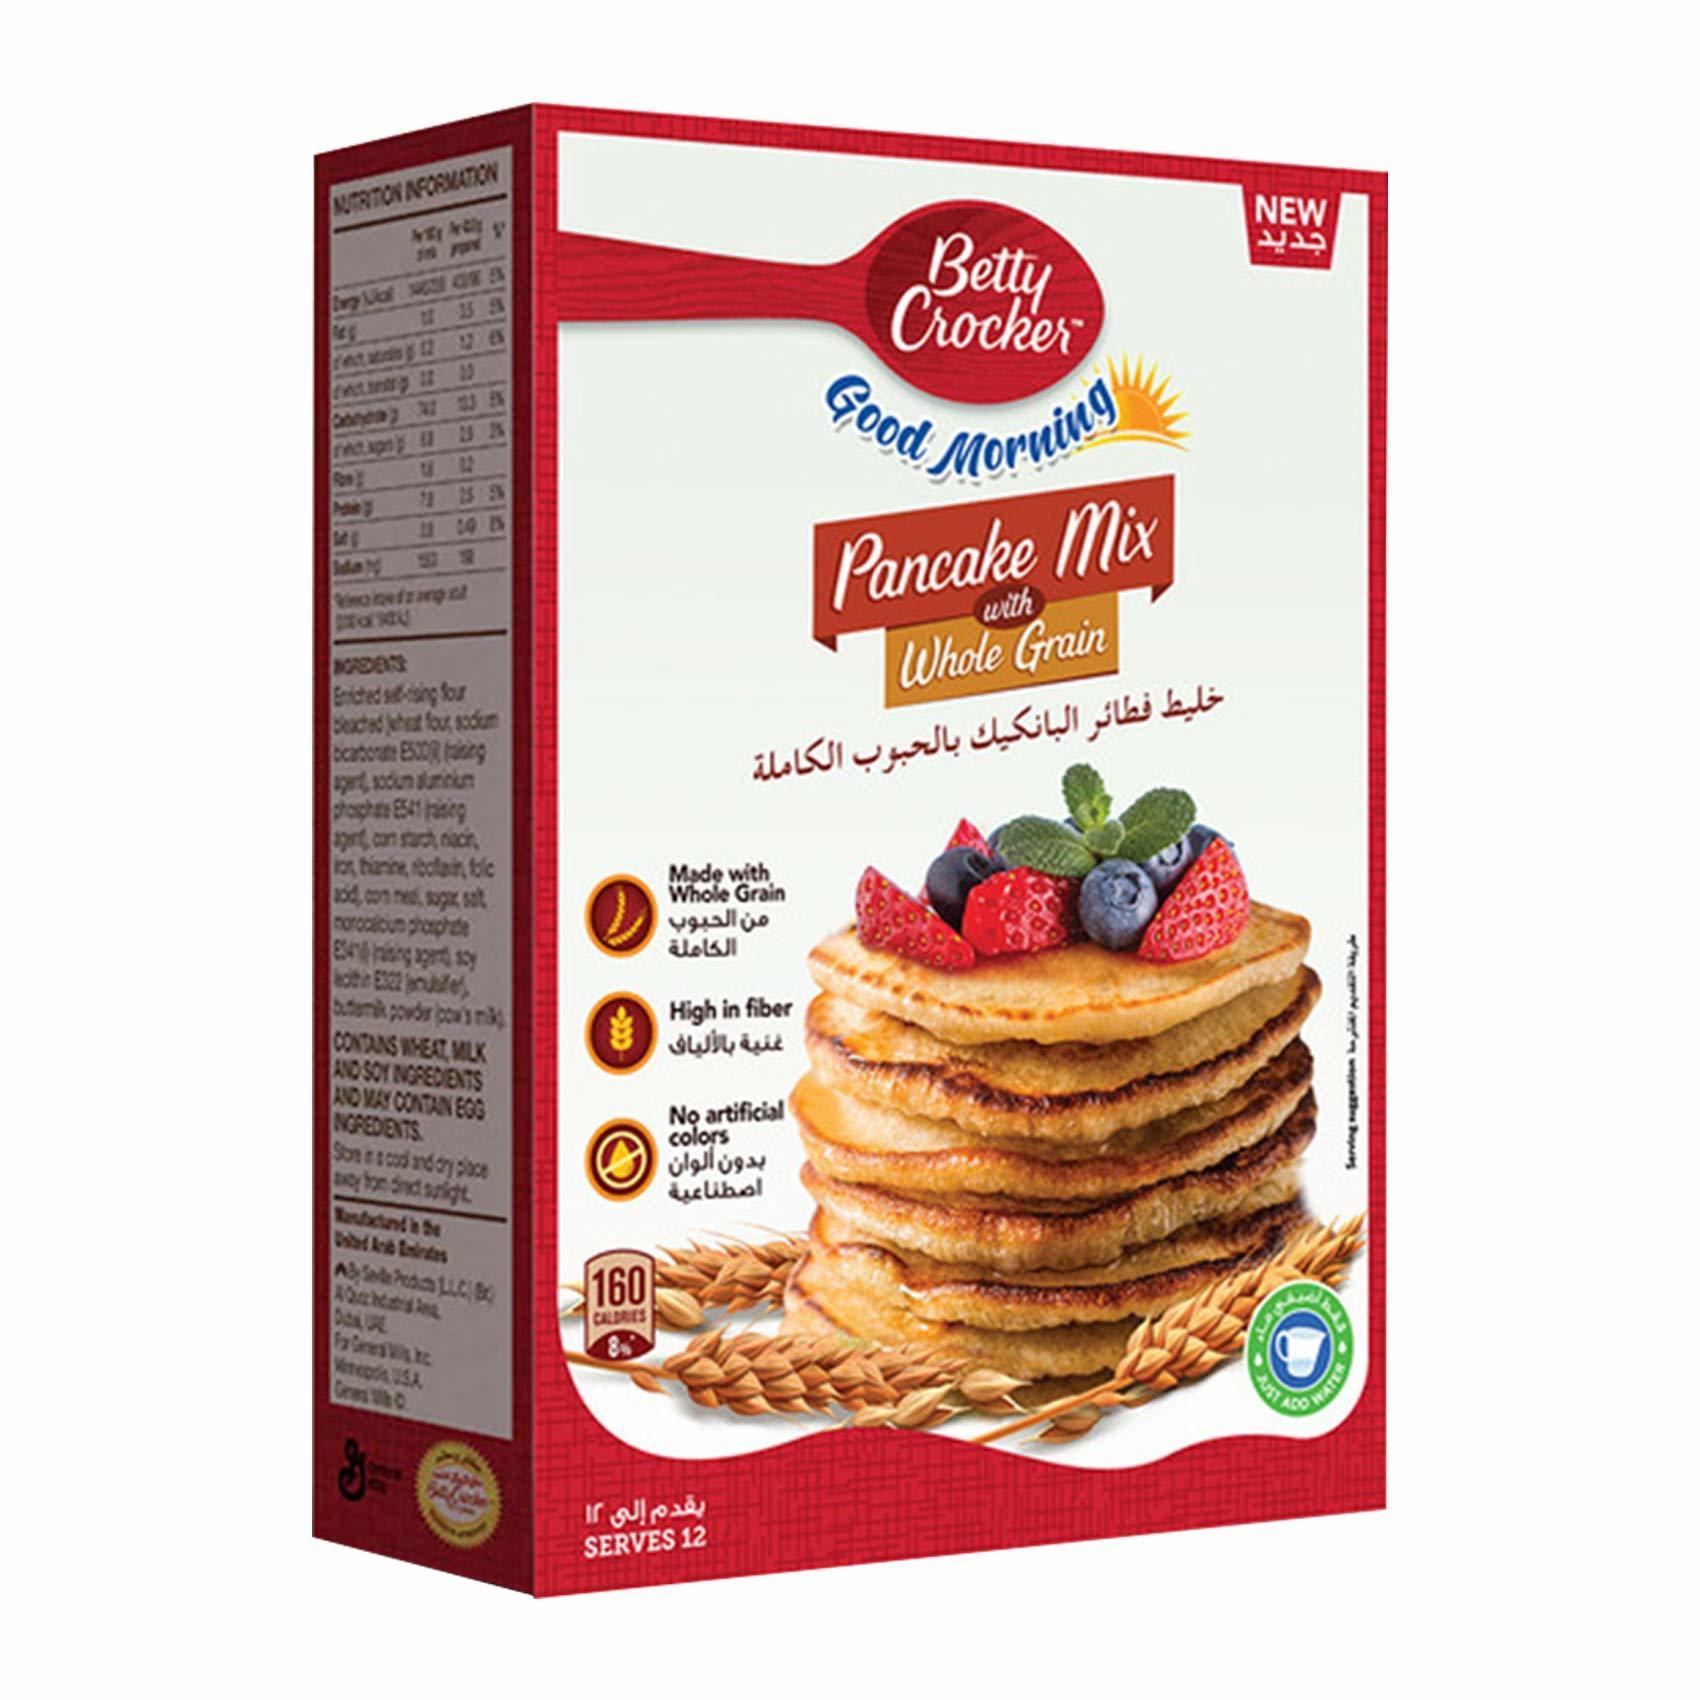 Buy Betty Crocker Pancake Mix Whole Grain 500 G Online Shop Food Cupboard On Carrefour Saudi Arabia